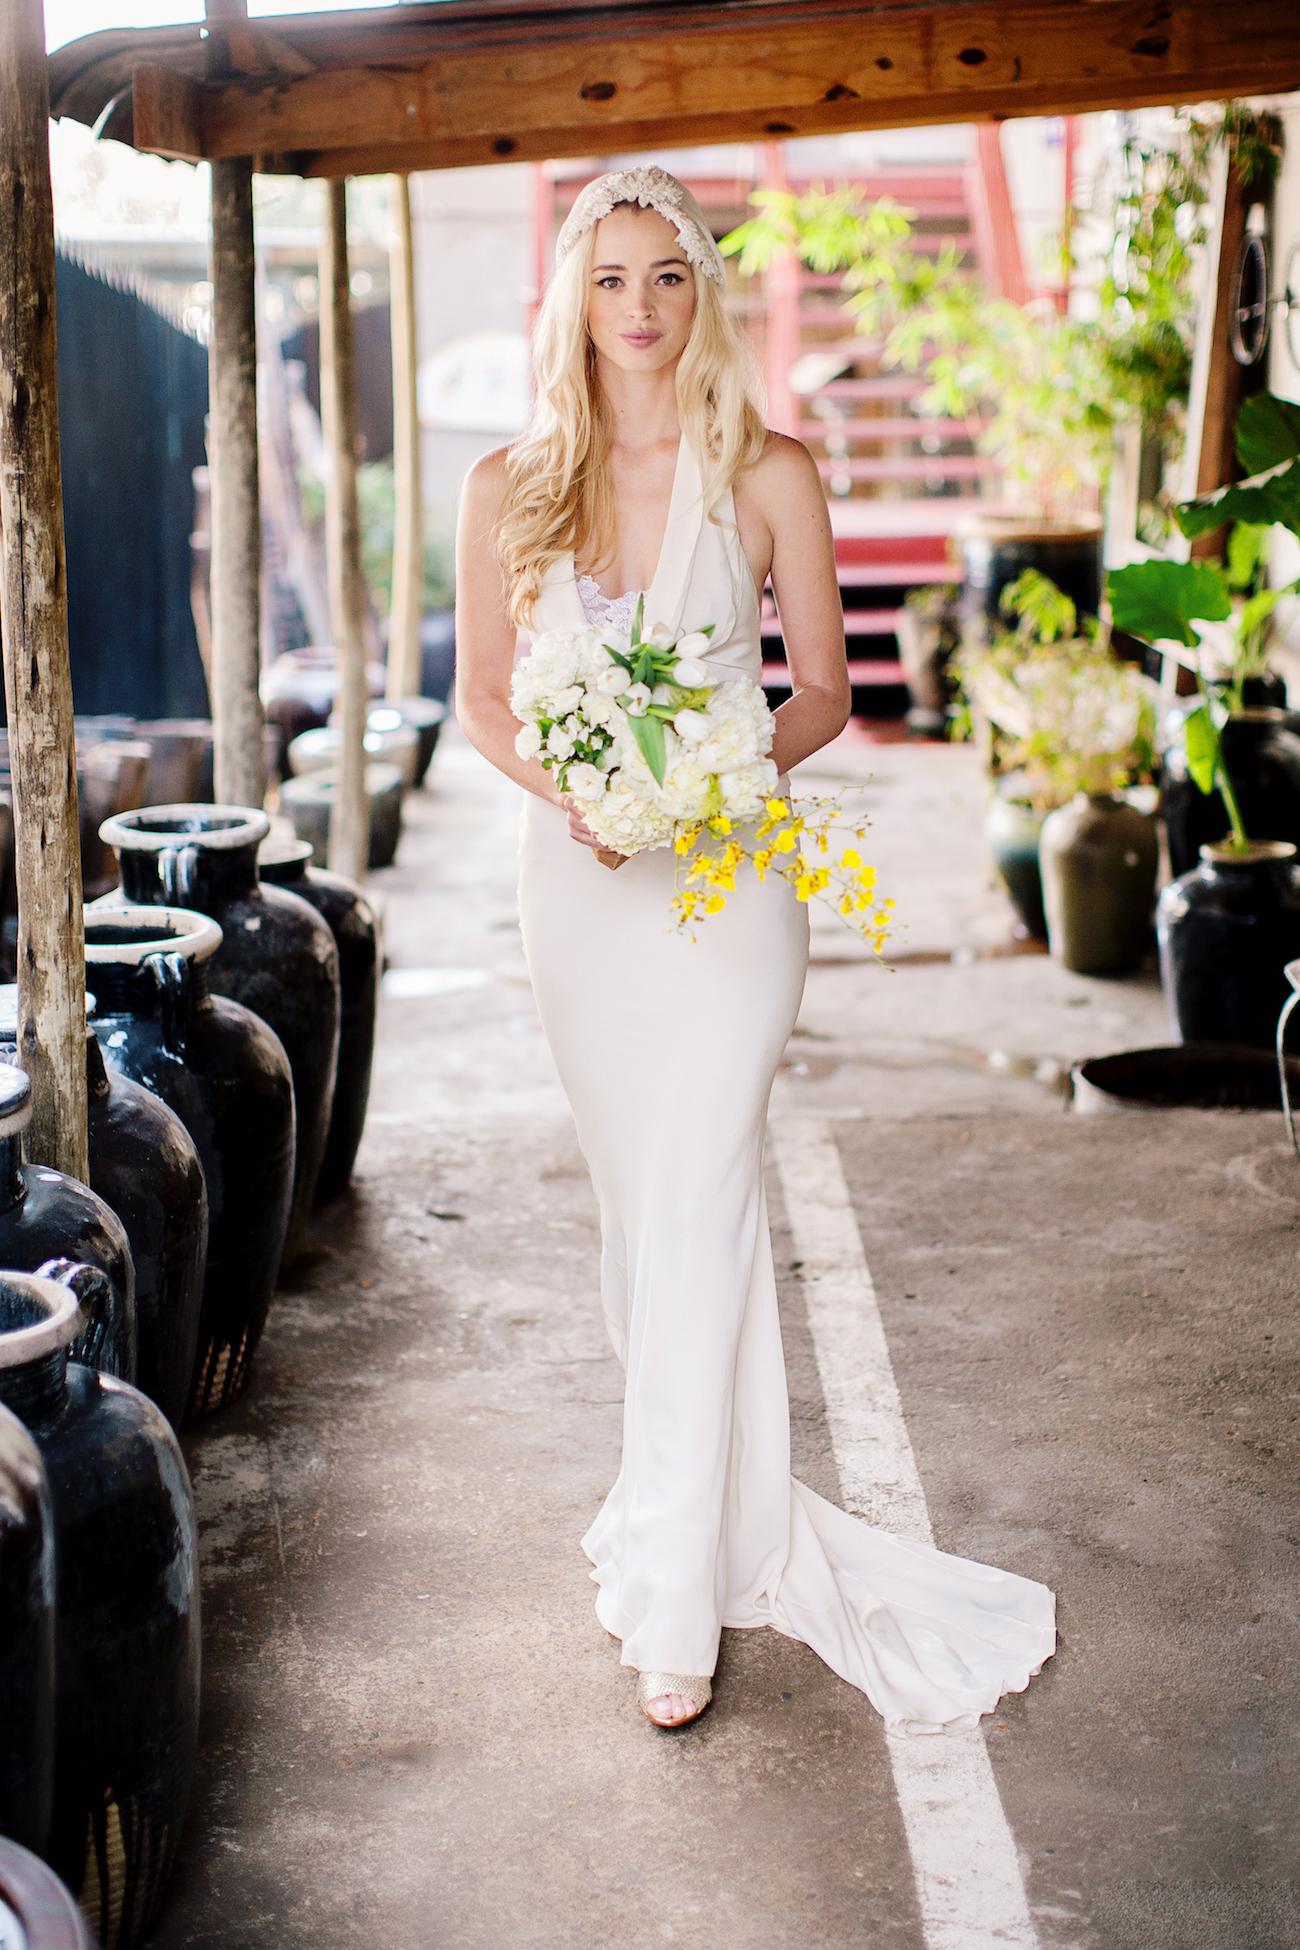 Boho Wedding Dress | Credit: Wedding Concepts & Tyme Photography